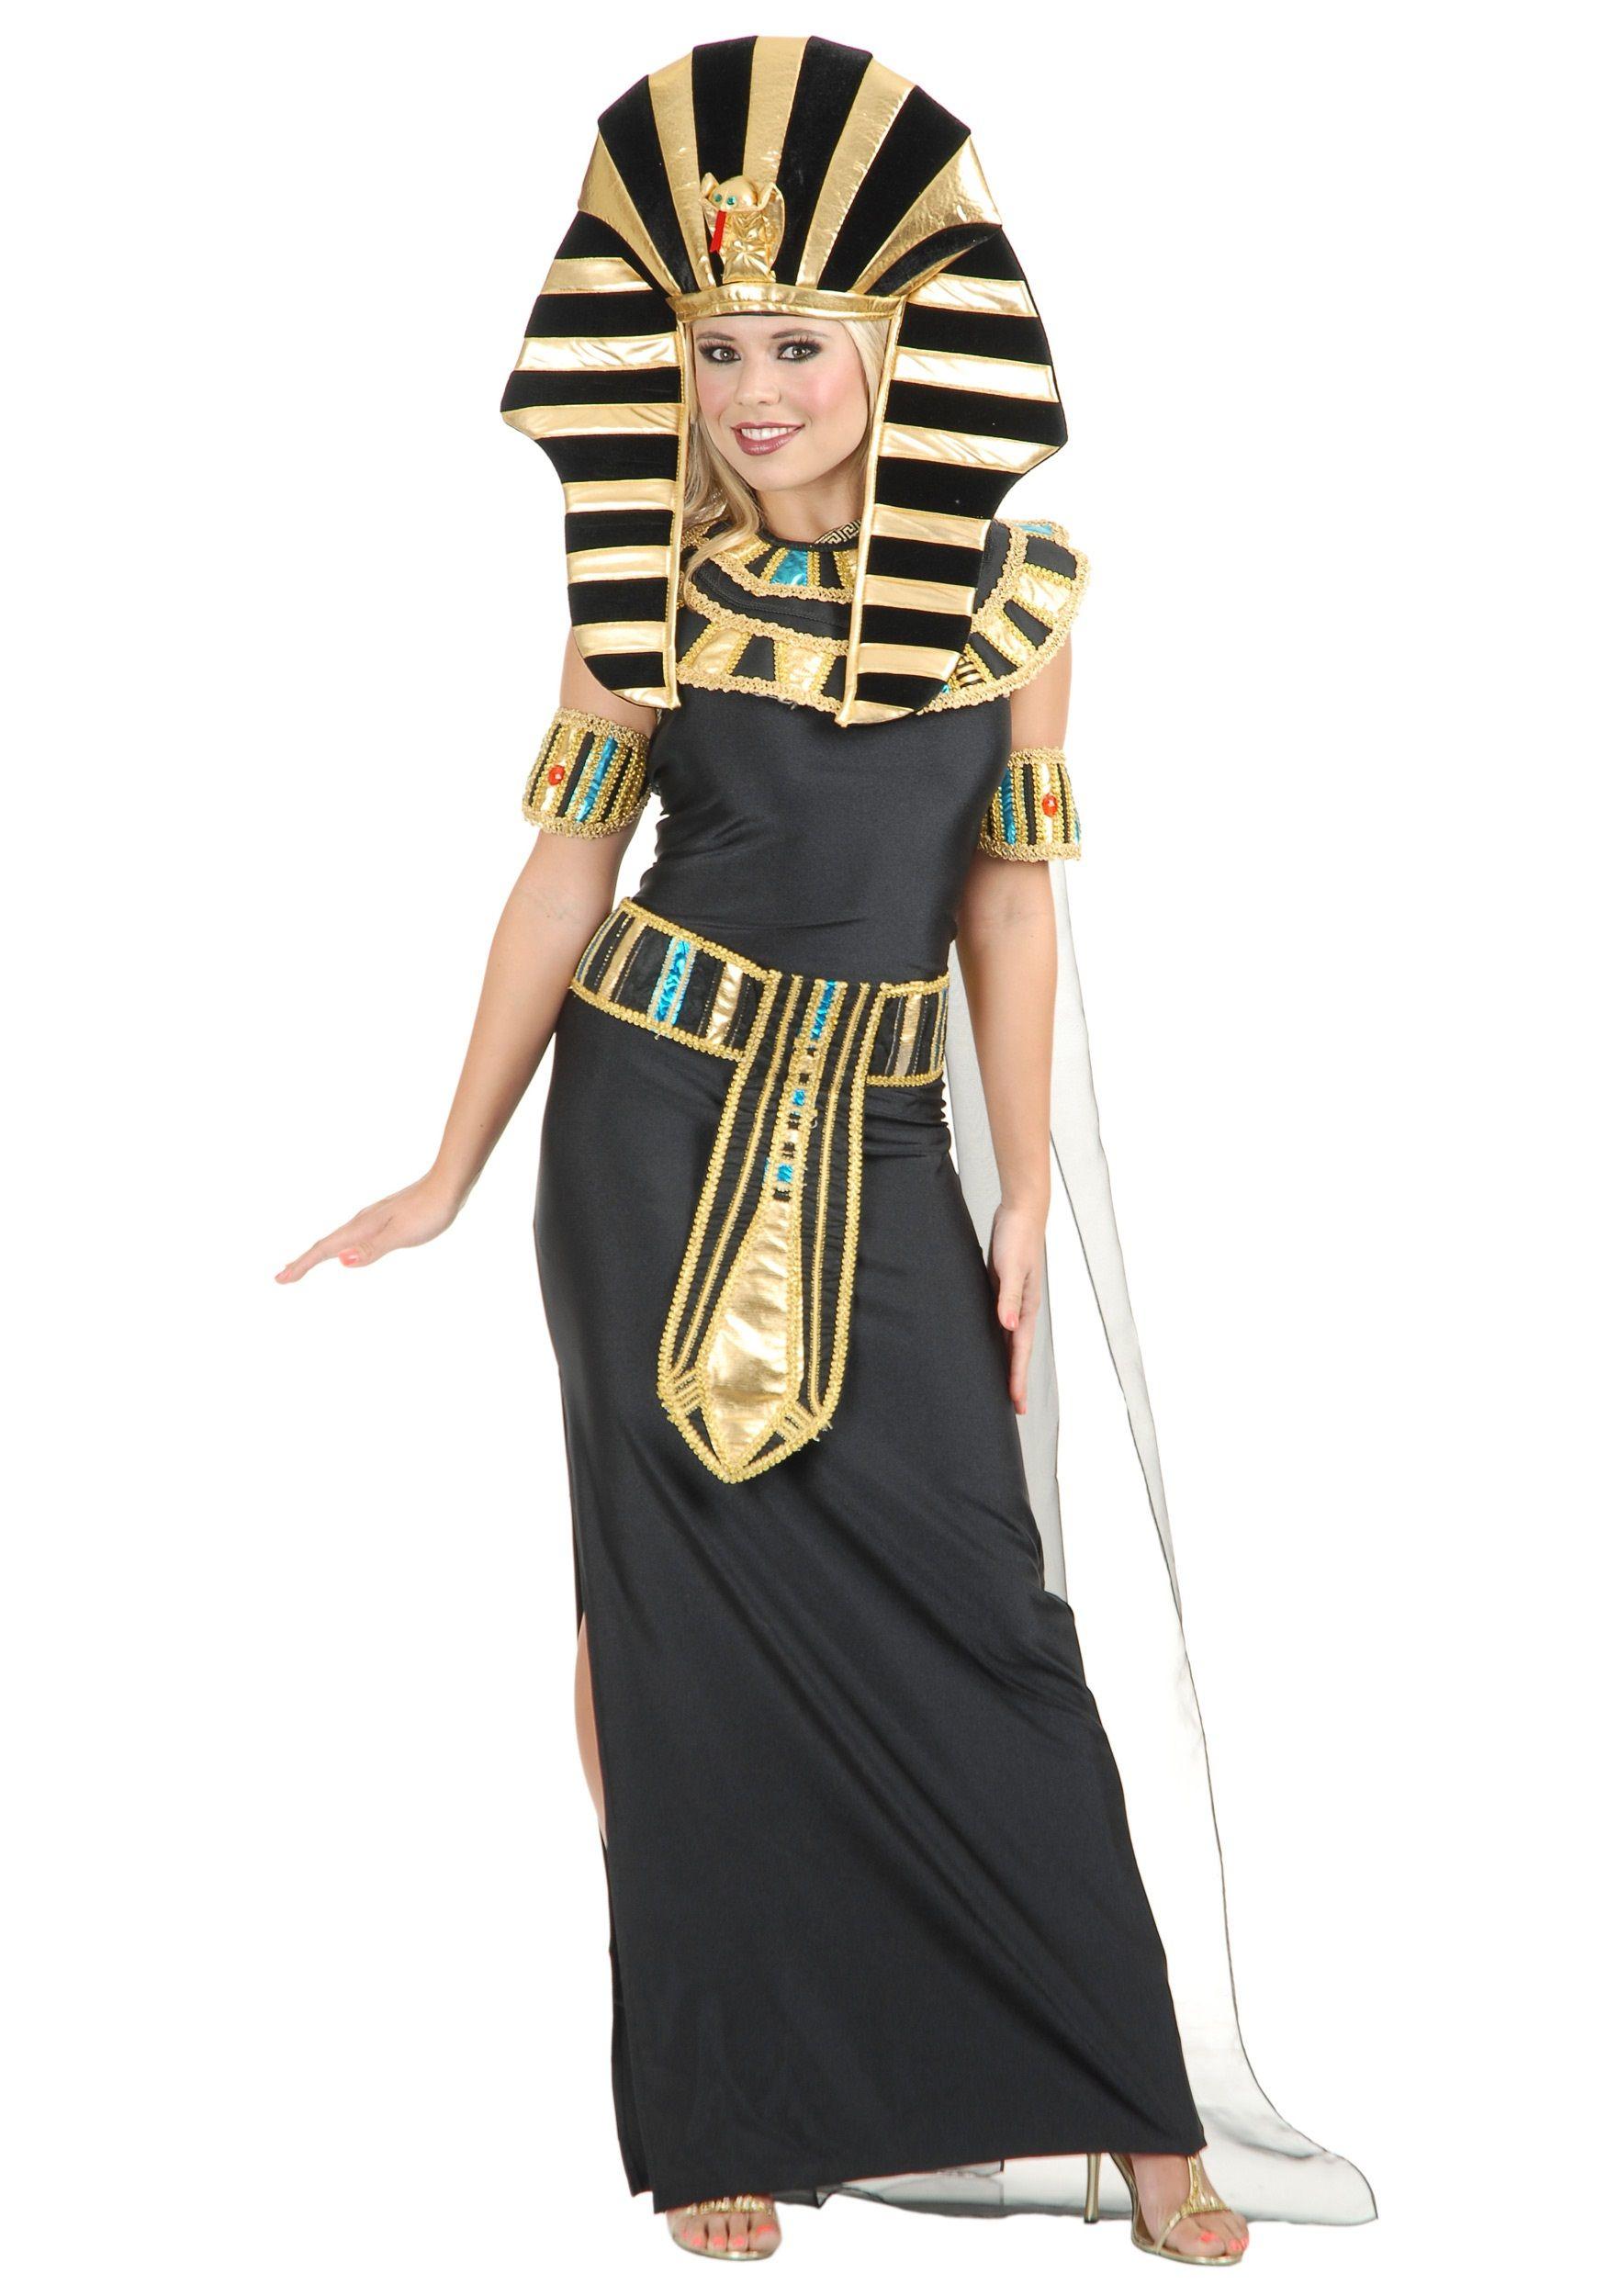 d guisement egyptien femme deguisement deguisement egyptien pinterest. Black Bedroom Furniture Sets. Home Design Ideas